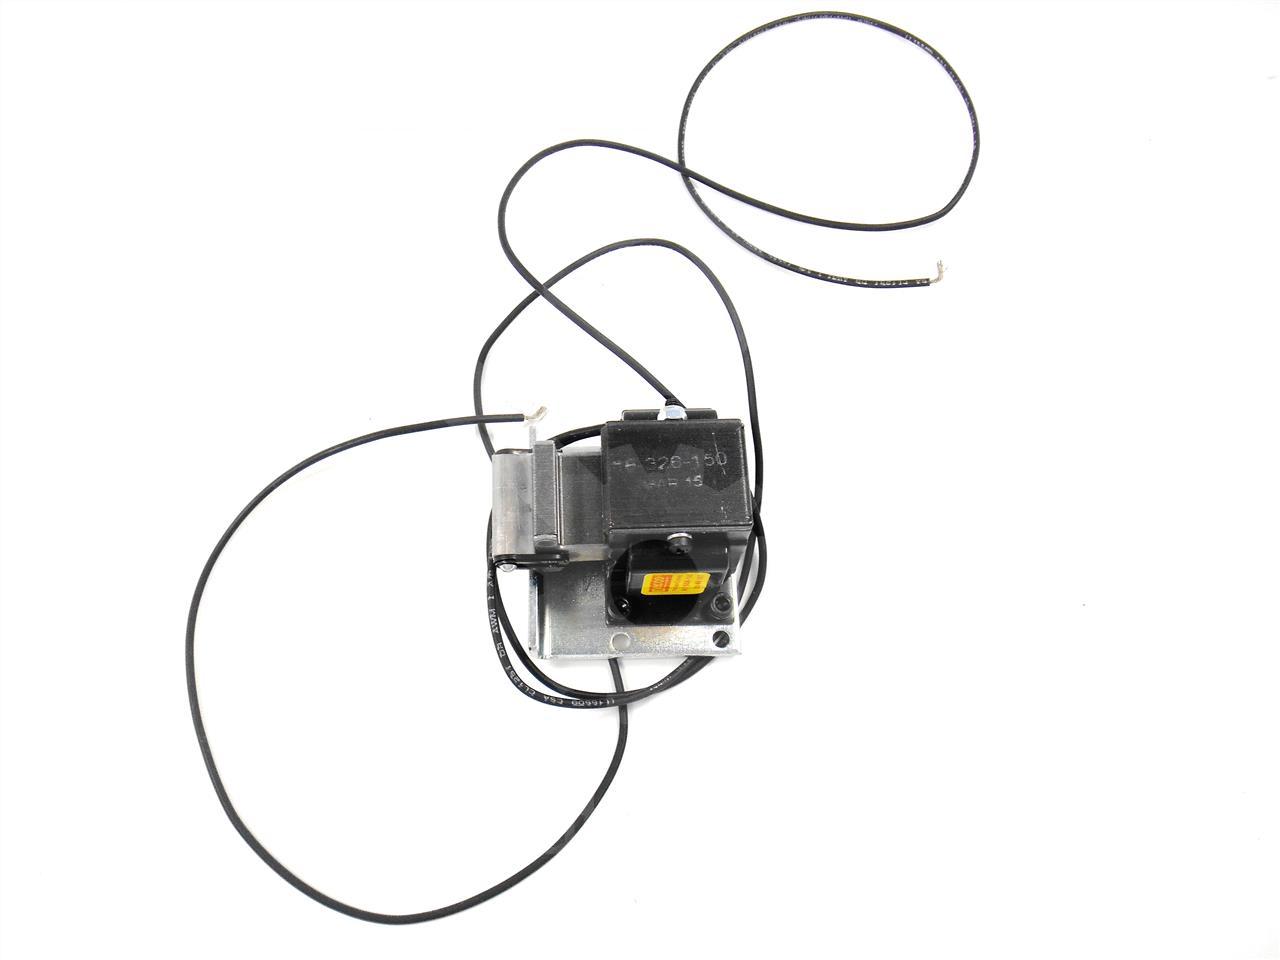 S12013 PRINGLE 120VAC SHUNT TRIP ASSEMBLY FOR PRINGLE QA